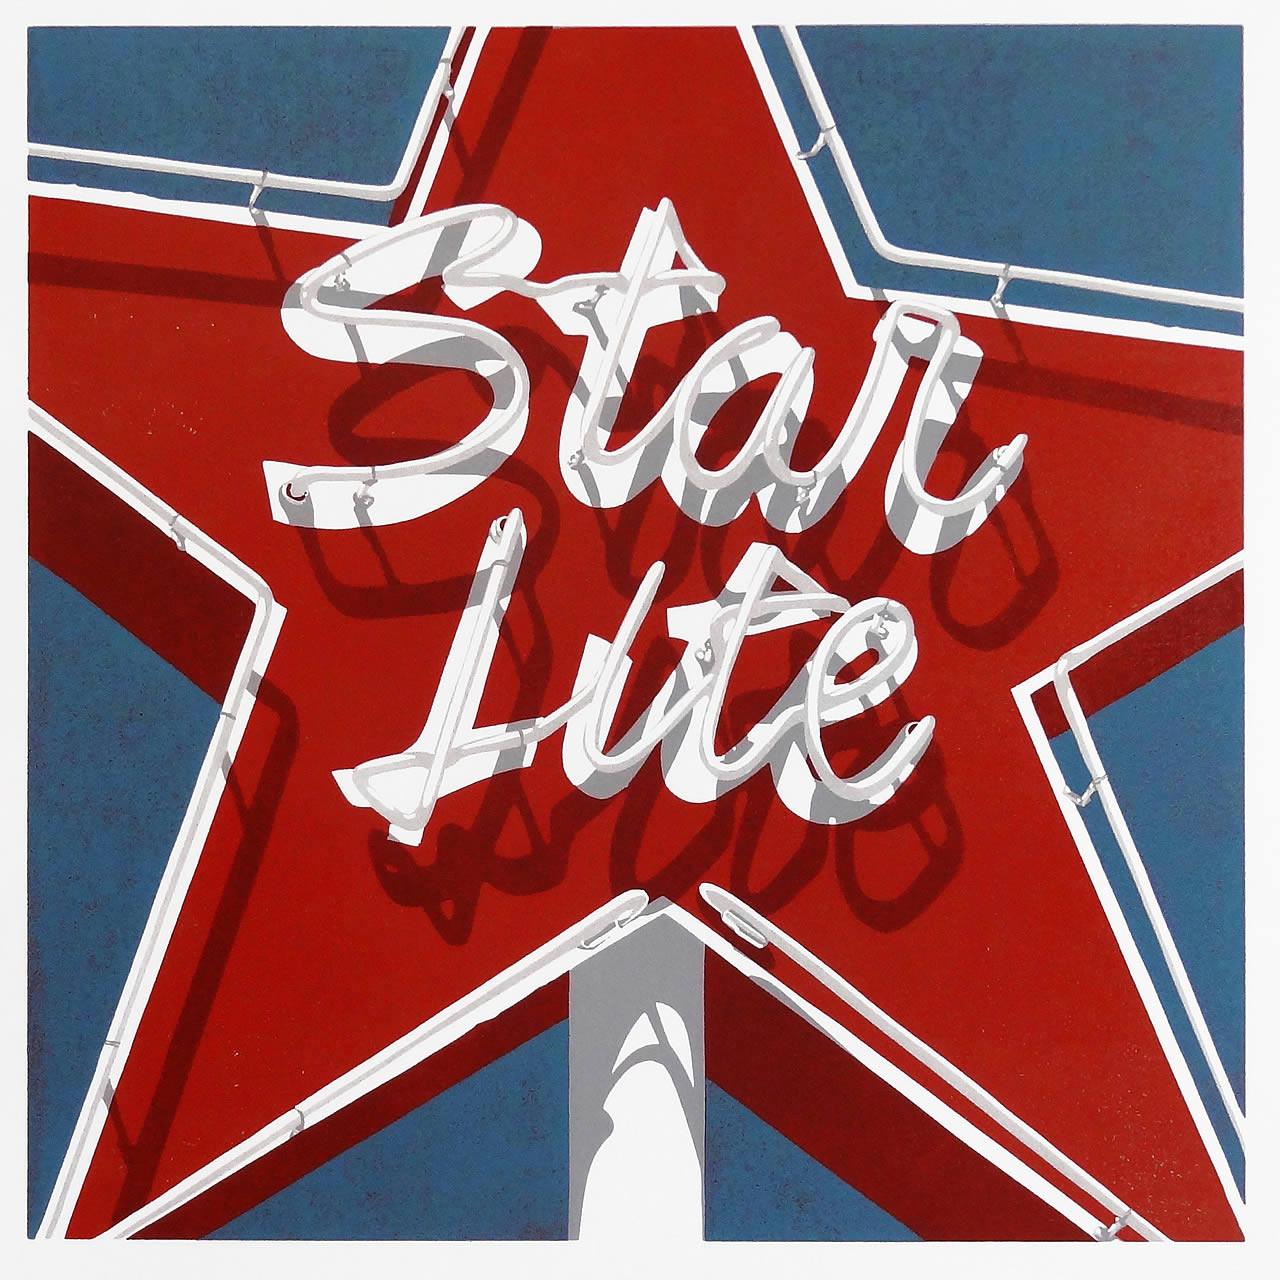 Starlight, Starbrite